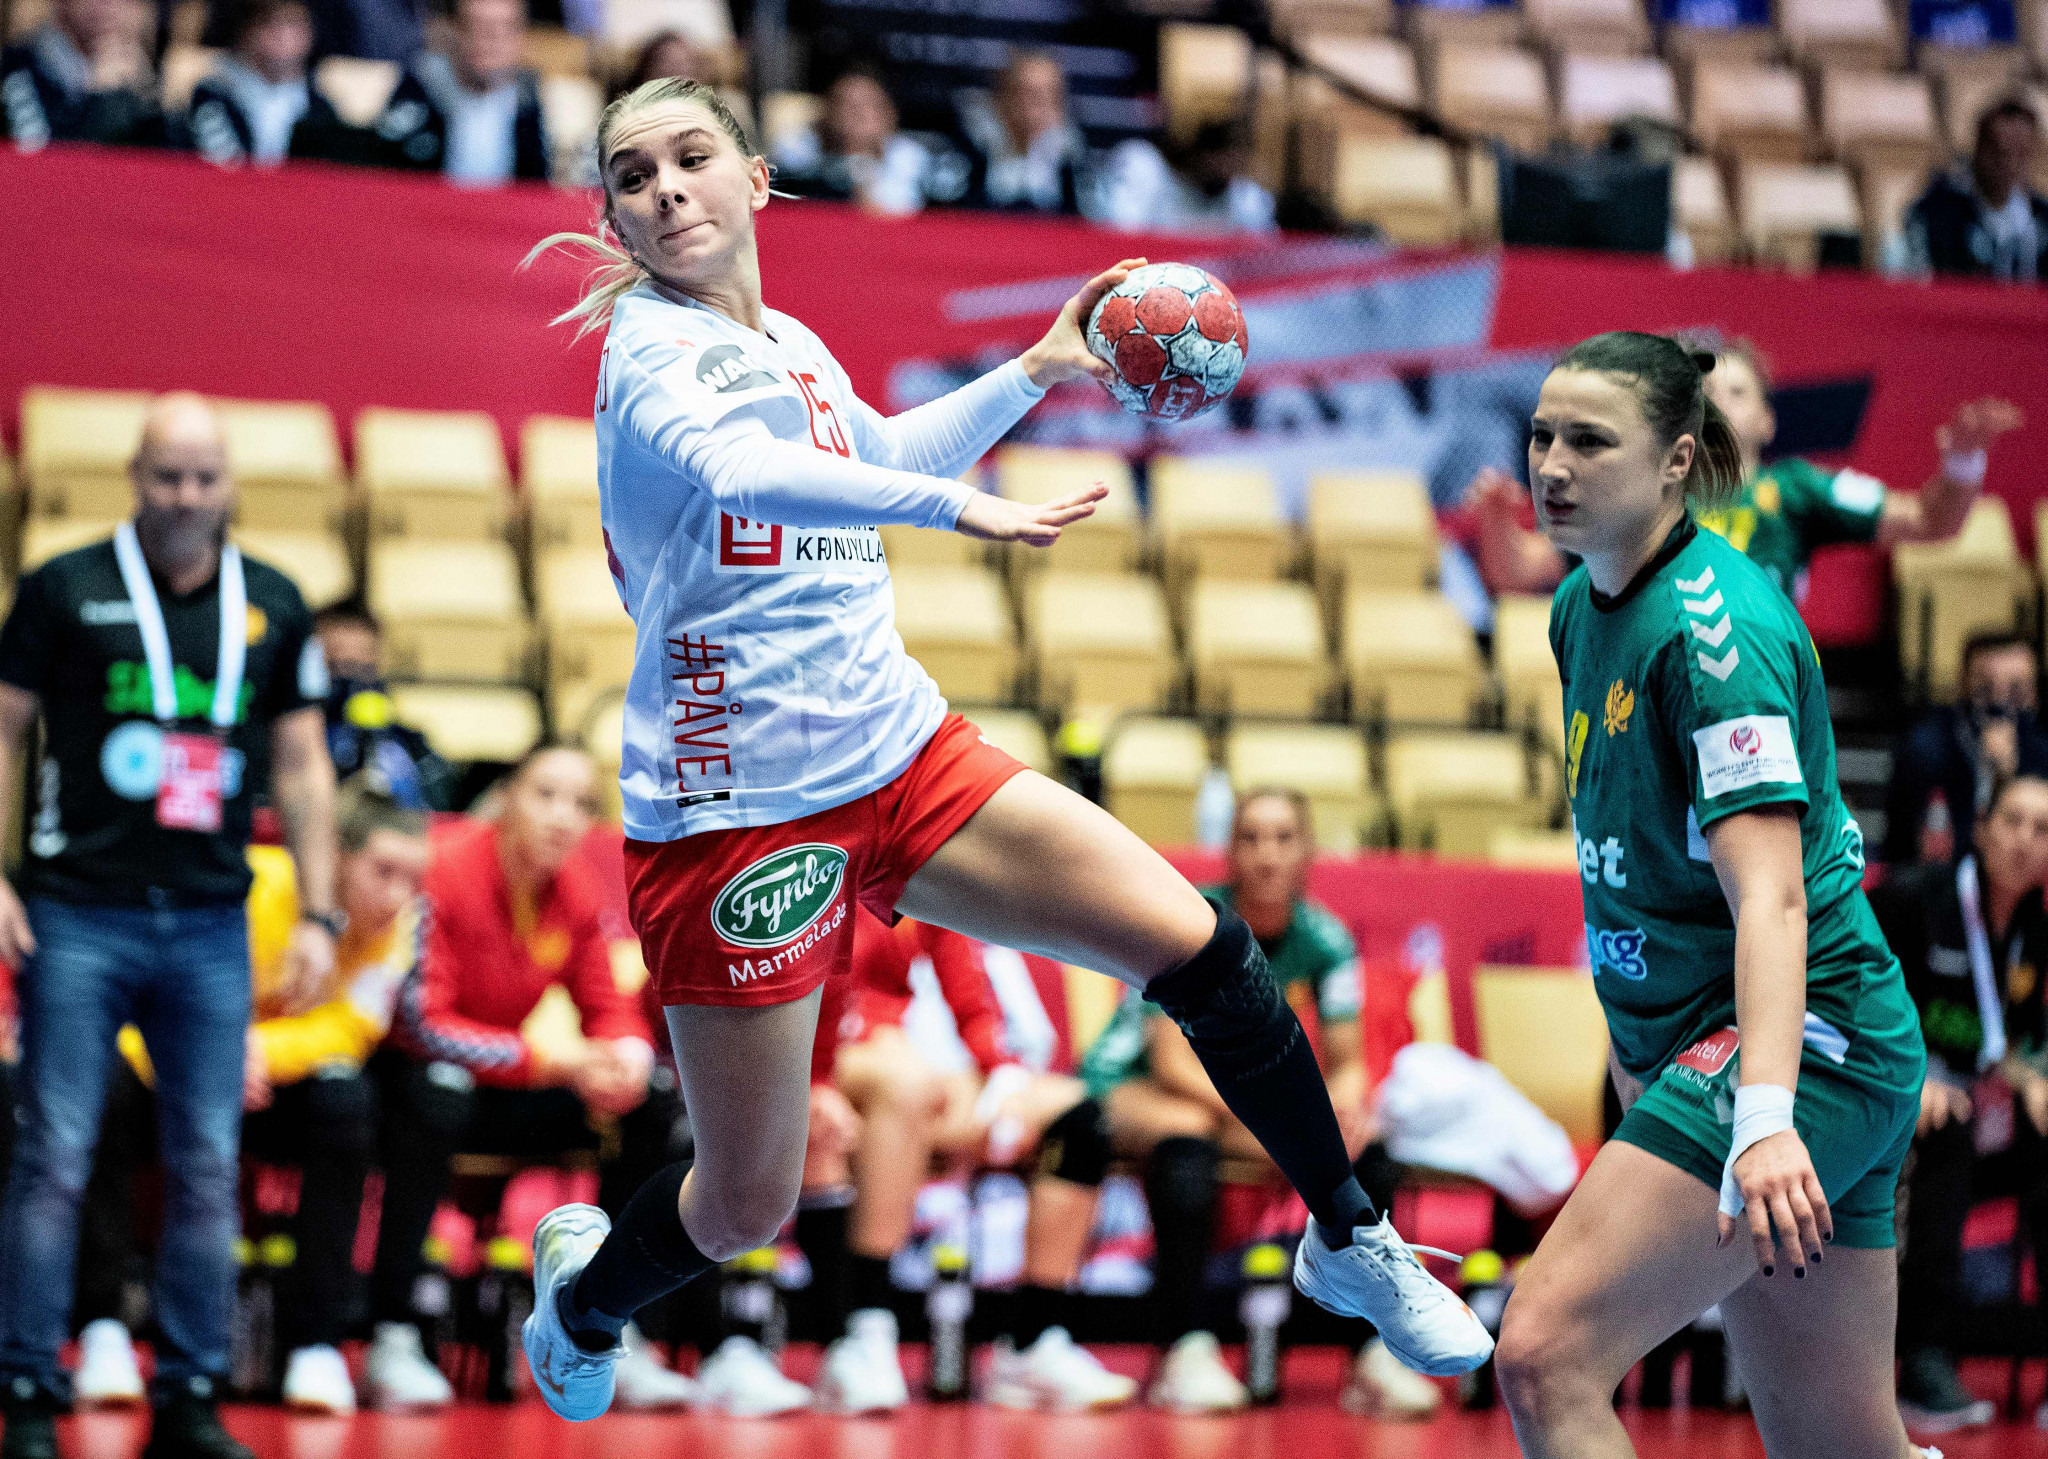 Back-to-back losses leave Dutch world champions in danger at European Women's Handball Championship